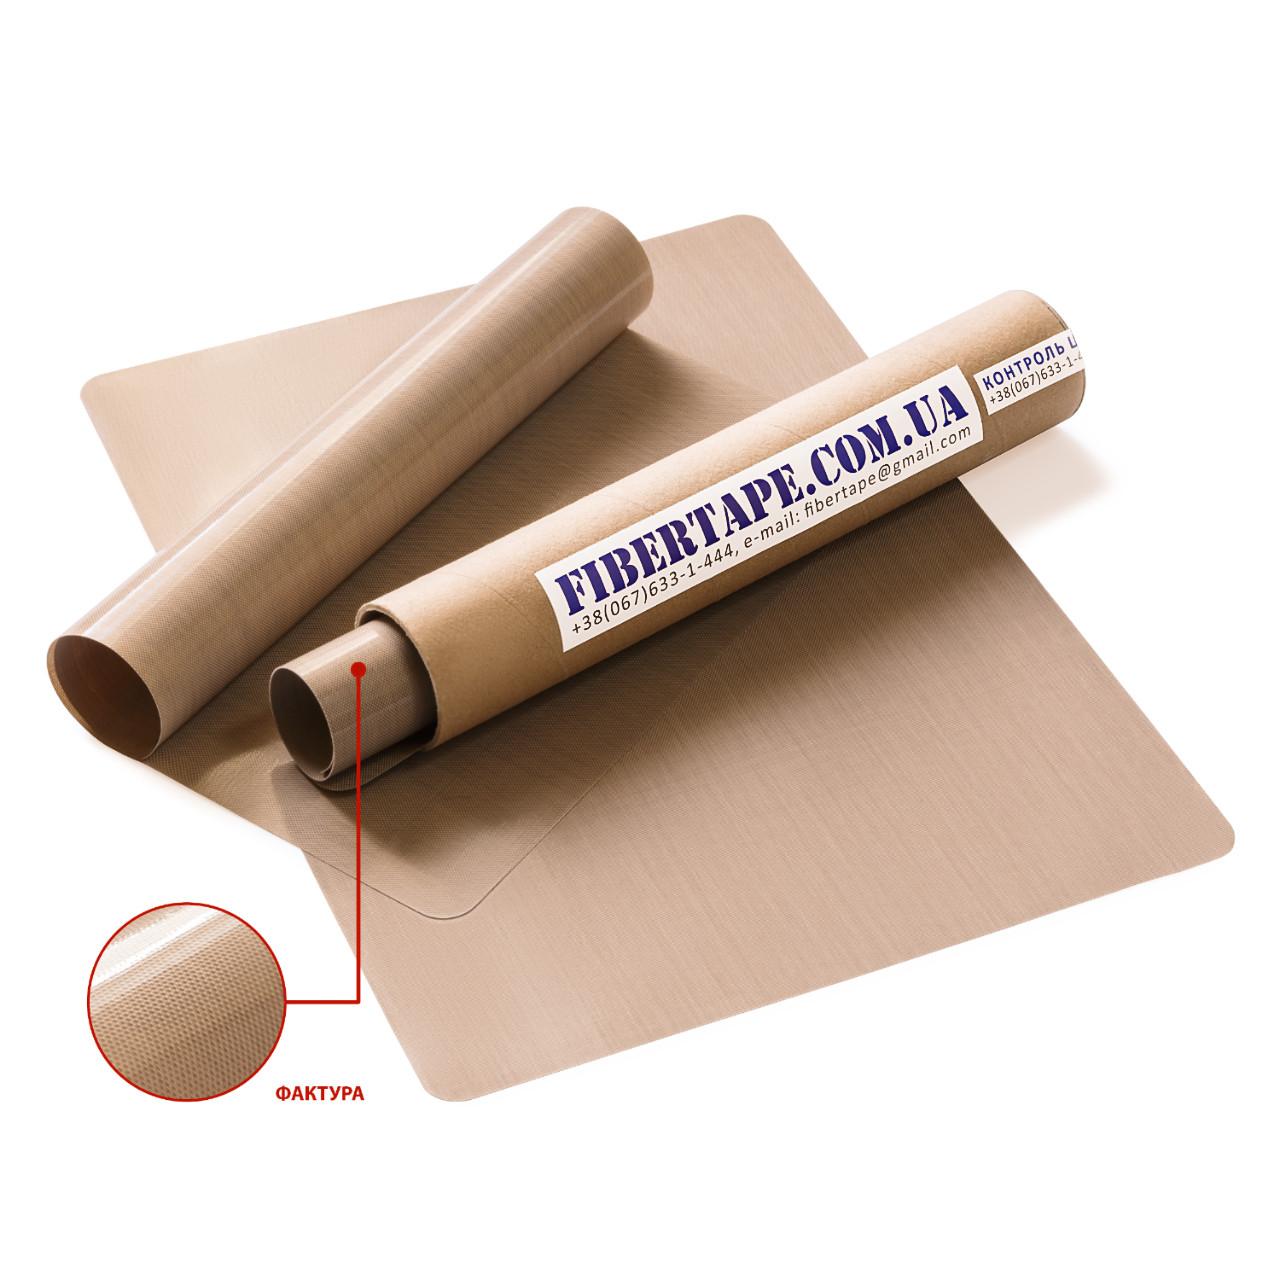 Тефлоновый коврик 40х60 см 0,013 мм для выпечки